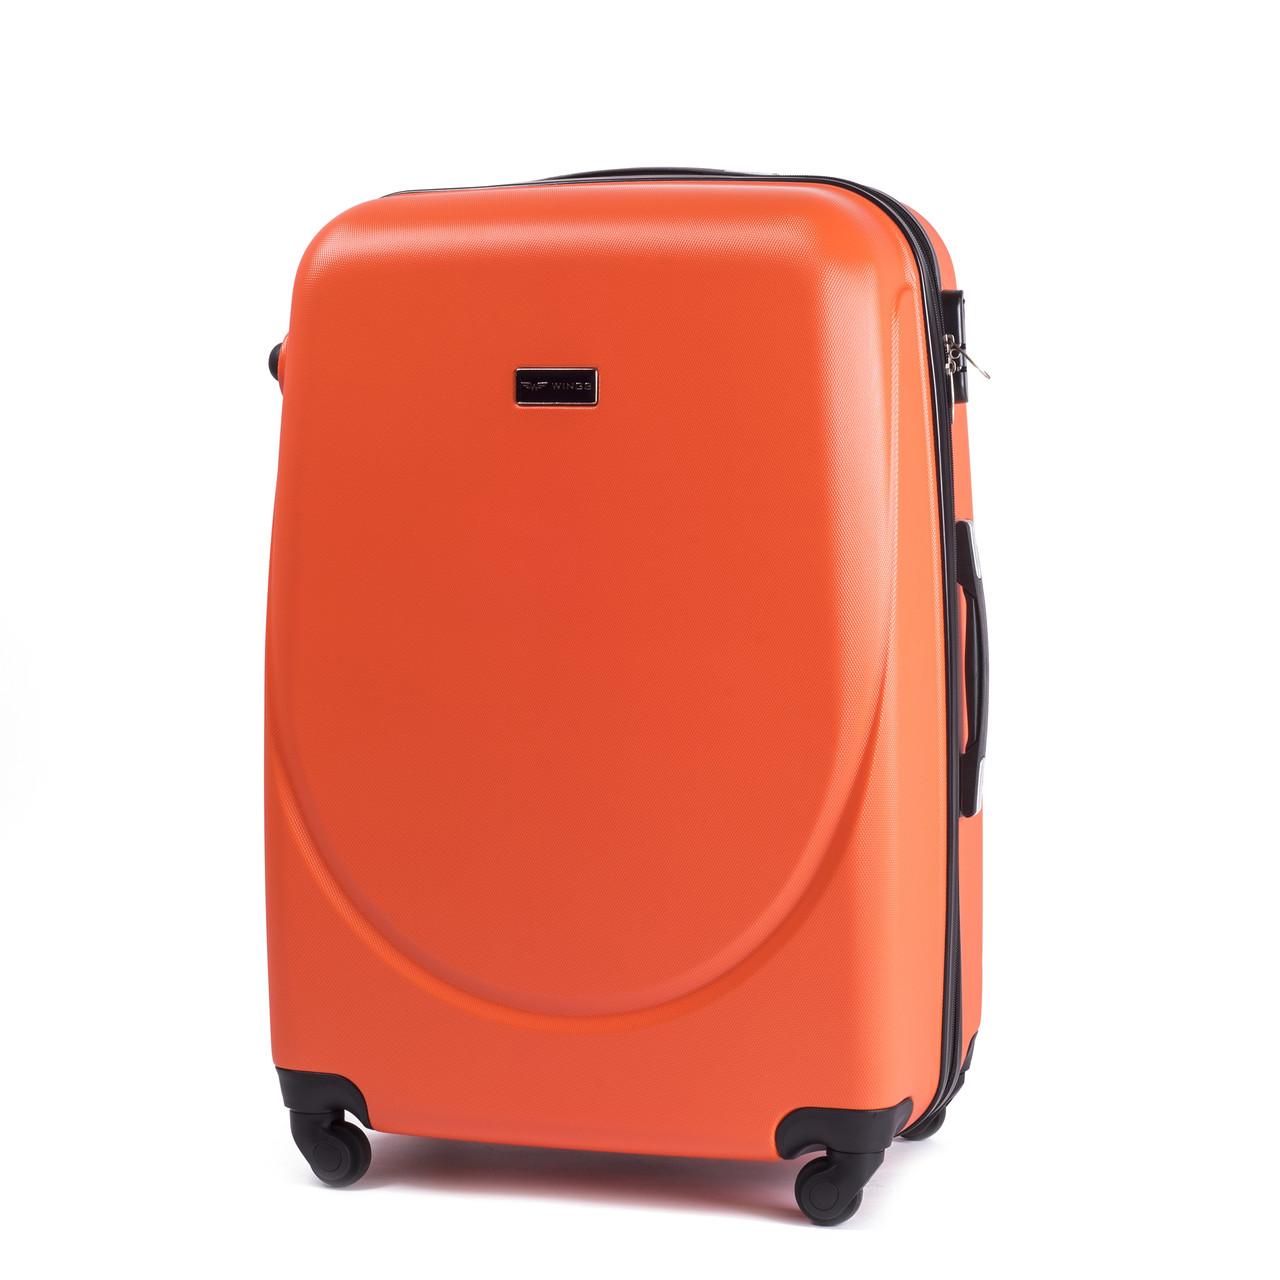 Чемодан Wings 310 cредний Orange на 4-х колесах с расширением